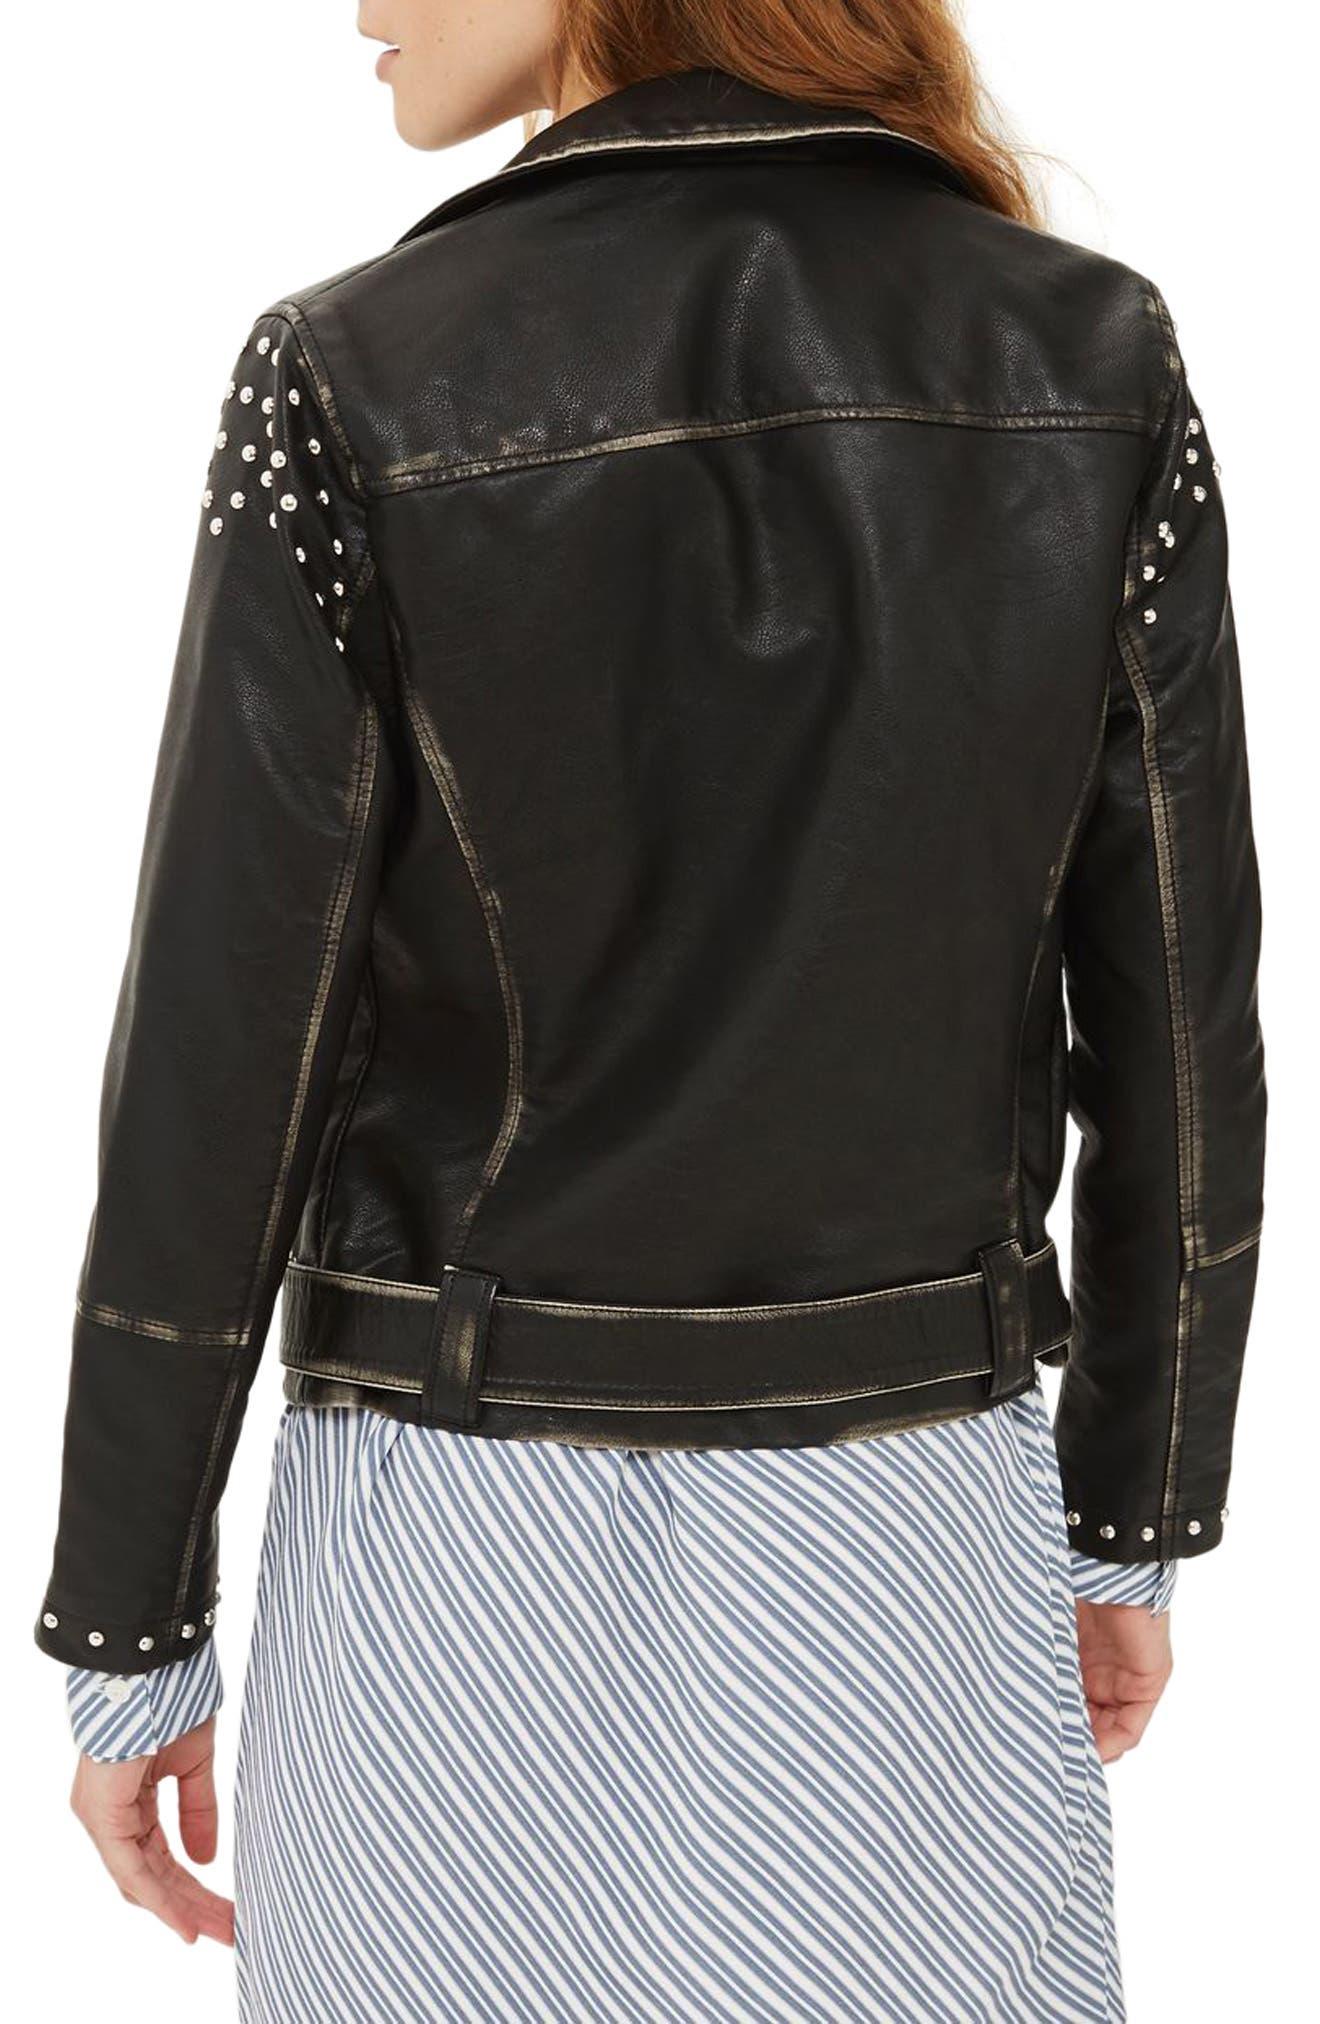 Naomi Studded Faux Leather Biker Jacket,                             Alternate thumbnail 2, color,